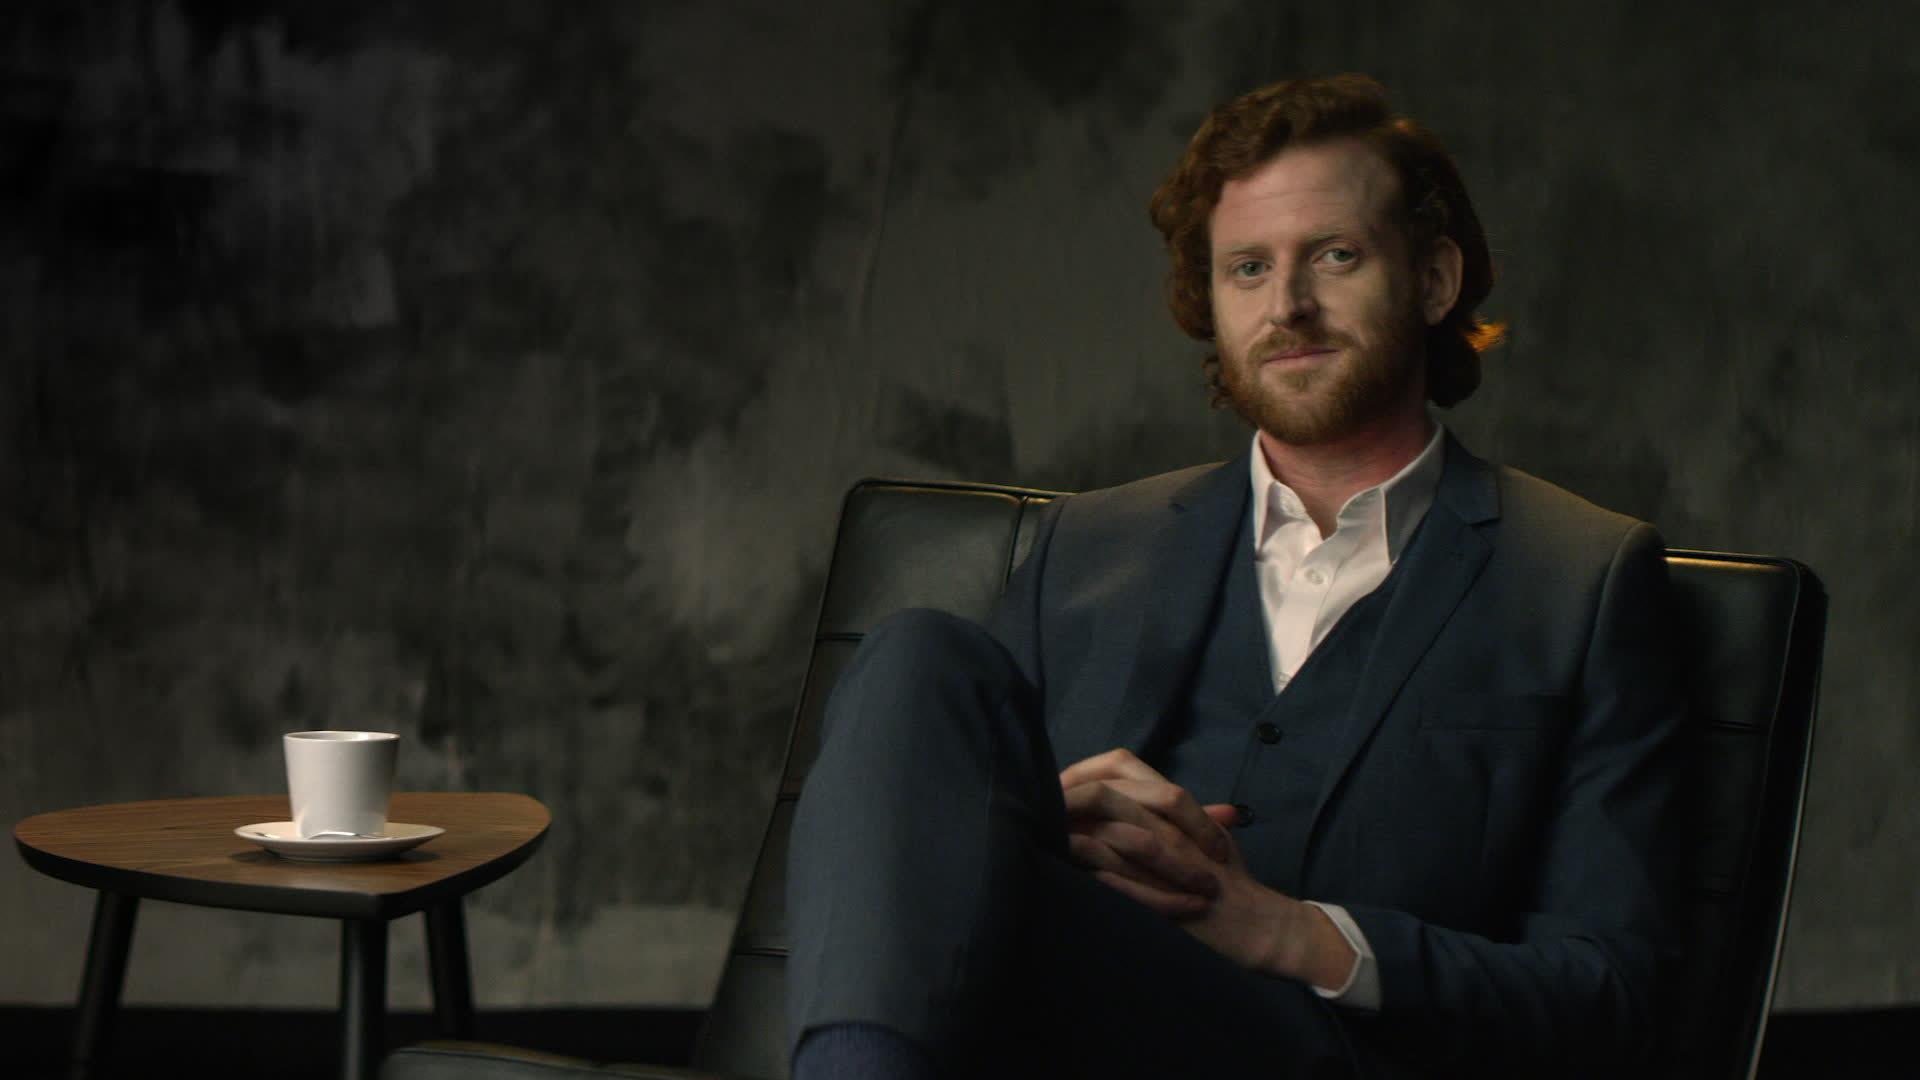 Audi A6 Filmwettbewerb: Mr. Comfort